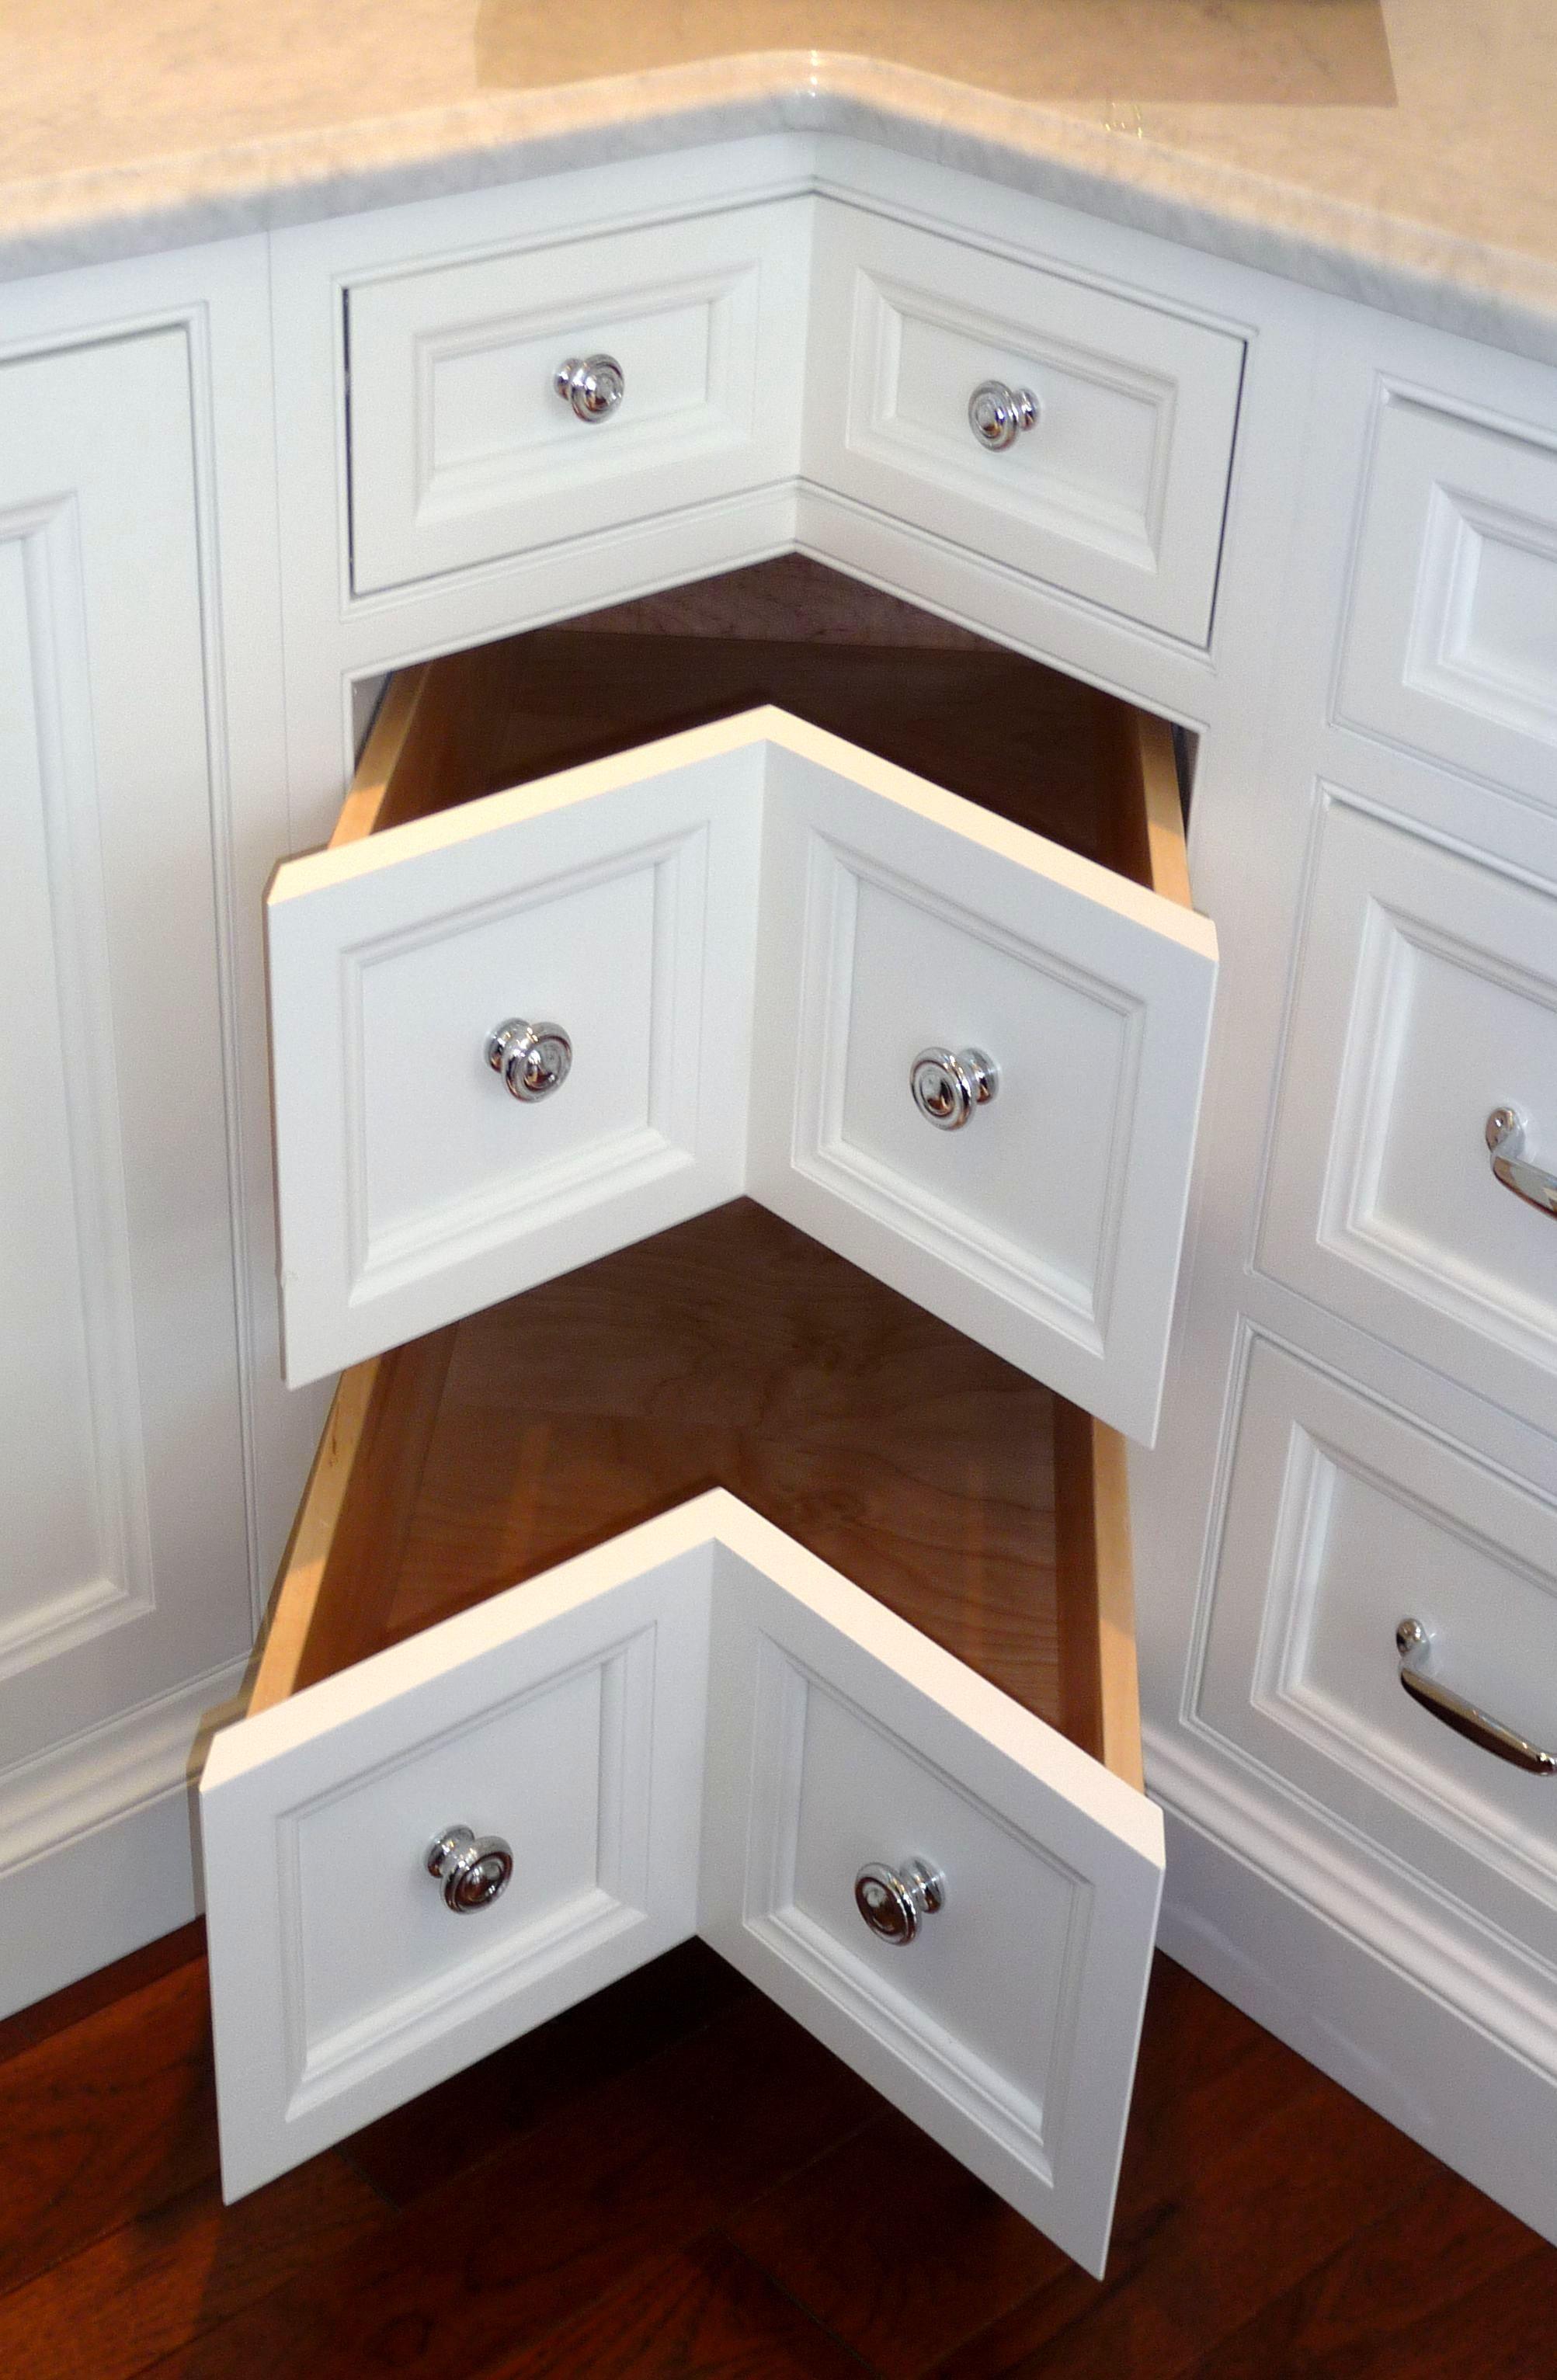 5 lazy susan alternatives in 2020 kitchen cabinet interior corner drawers corner kitchen cabinet on kitchen cabinets organization layout id=42712